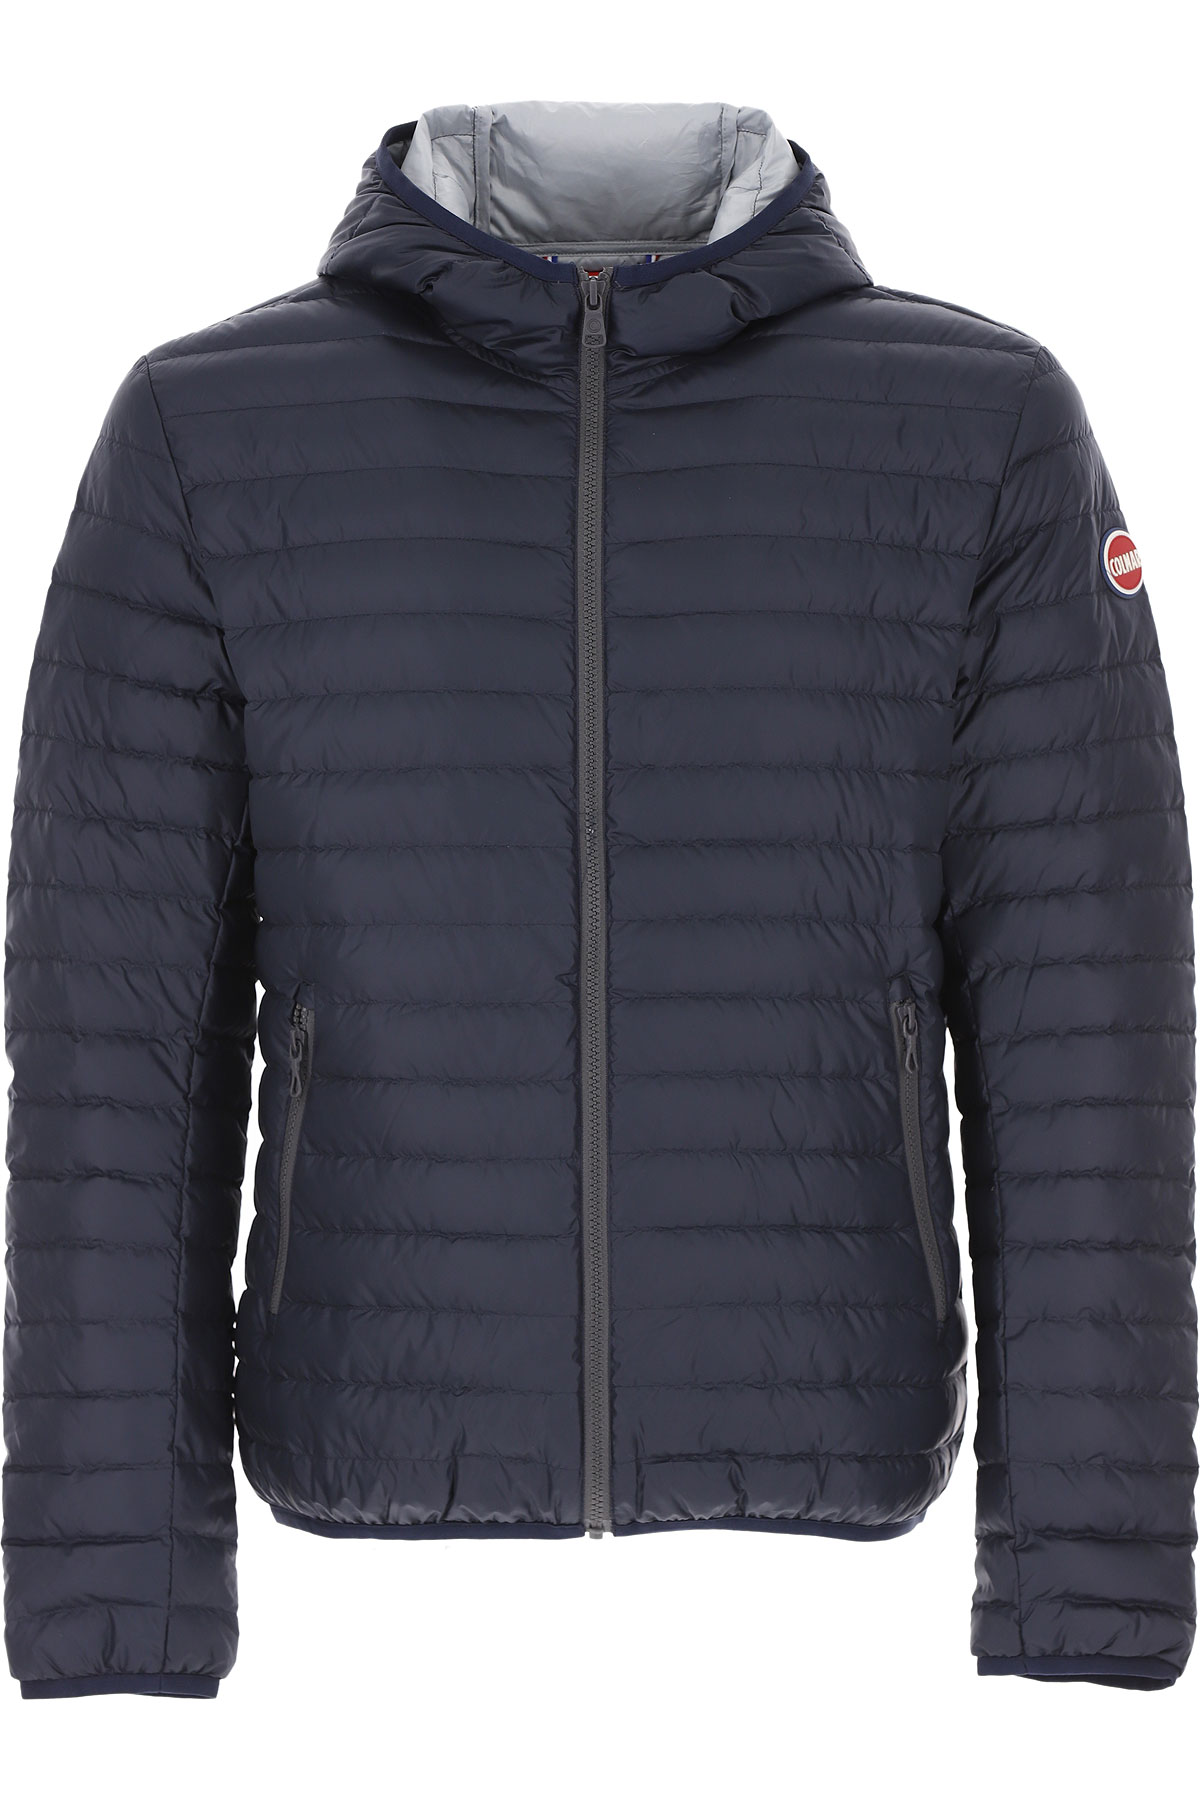 Colmar Down Jacket for Men, Puffer Ski Jacket On Sale, Navy Blue, Down, 2019, L M S XL XXL XXXL